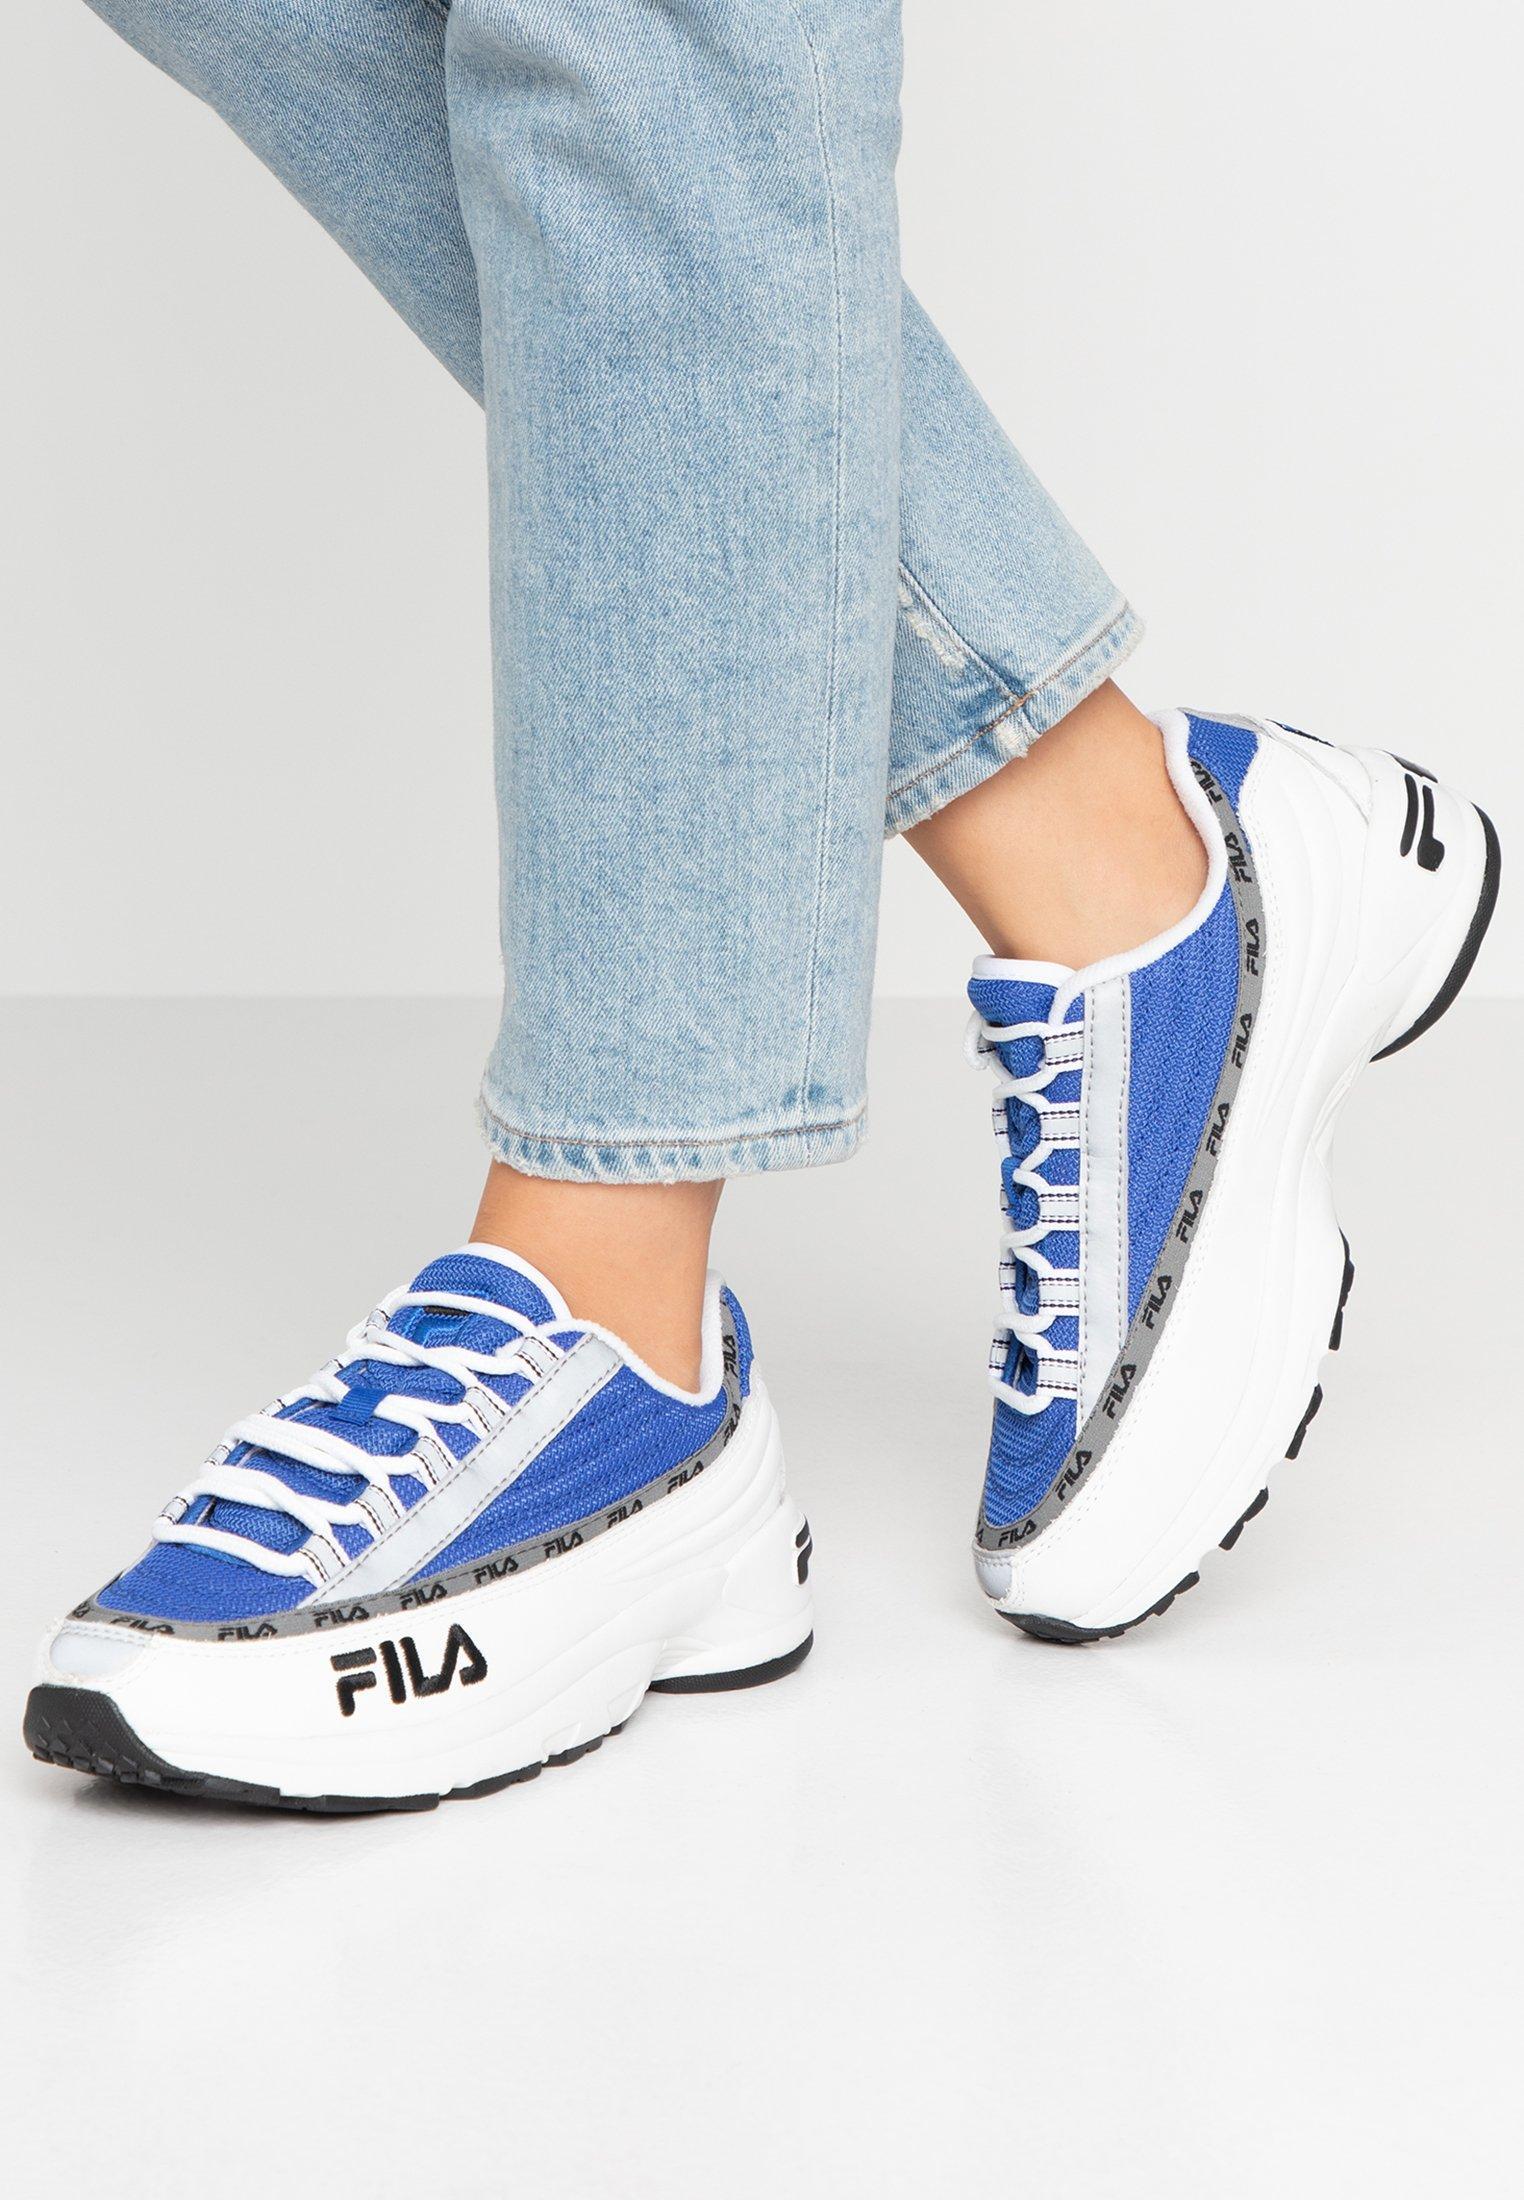 Fila DSTR97 Sneakers basse white Zalando.it